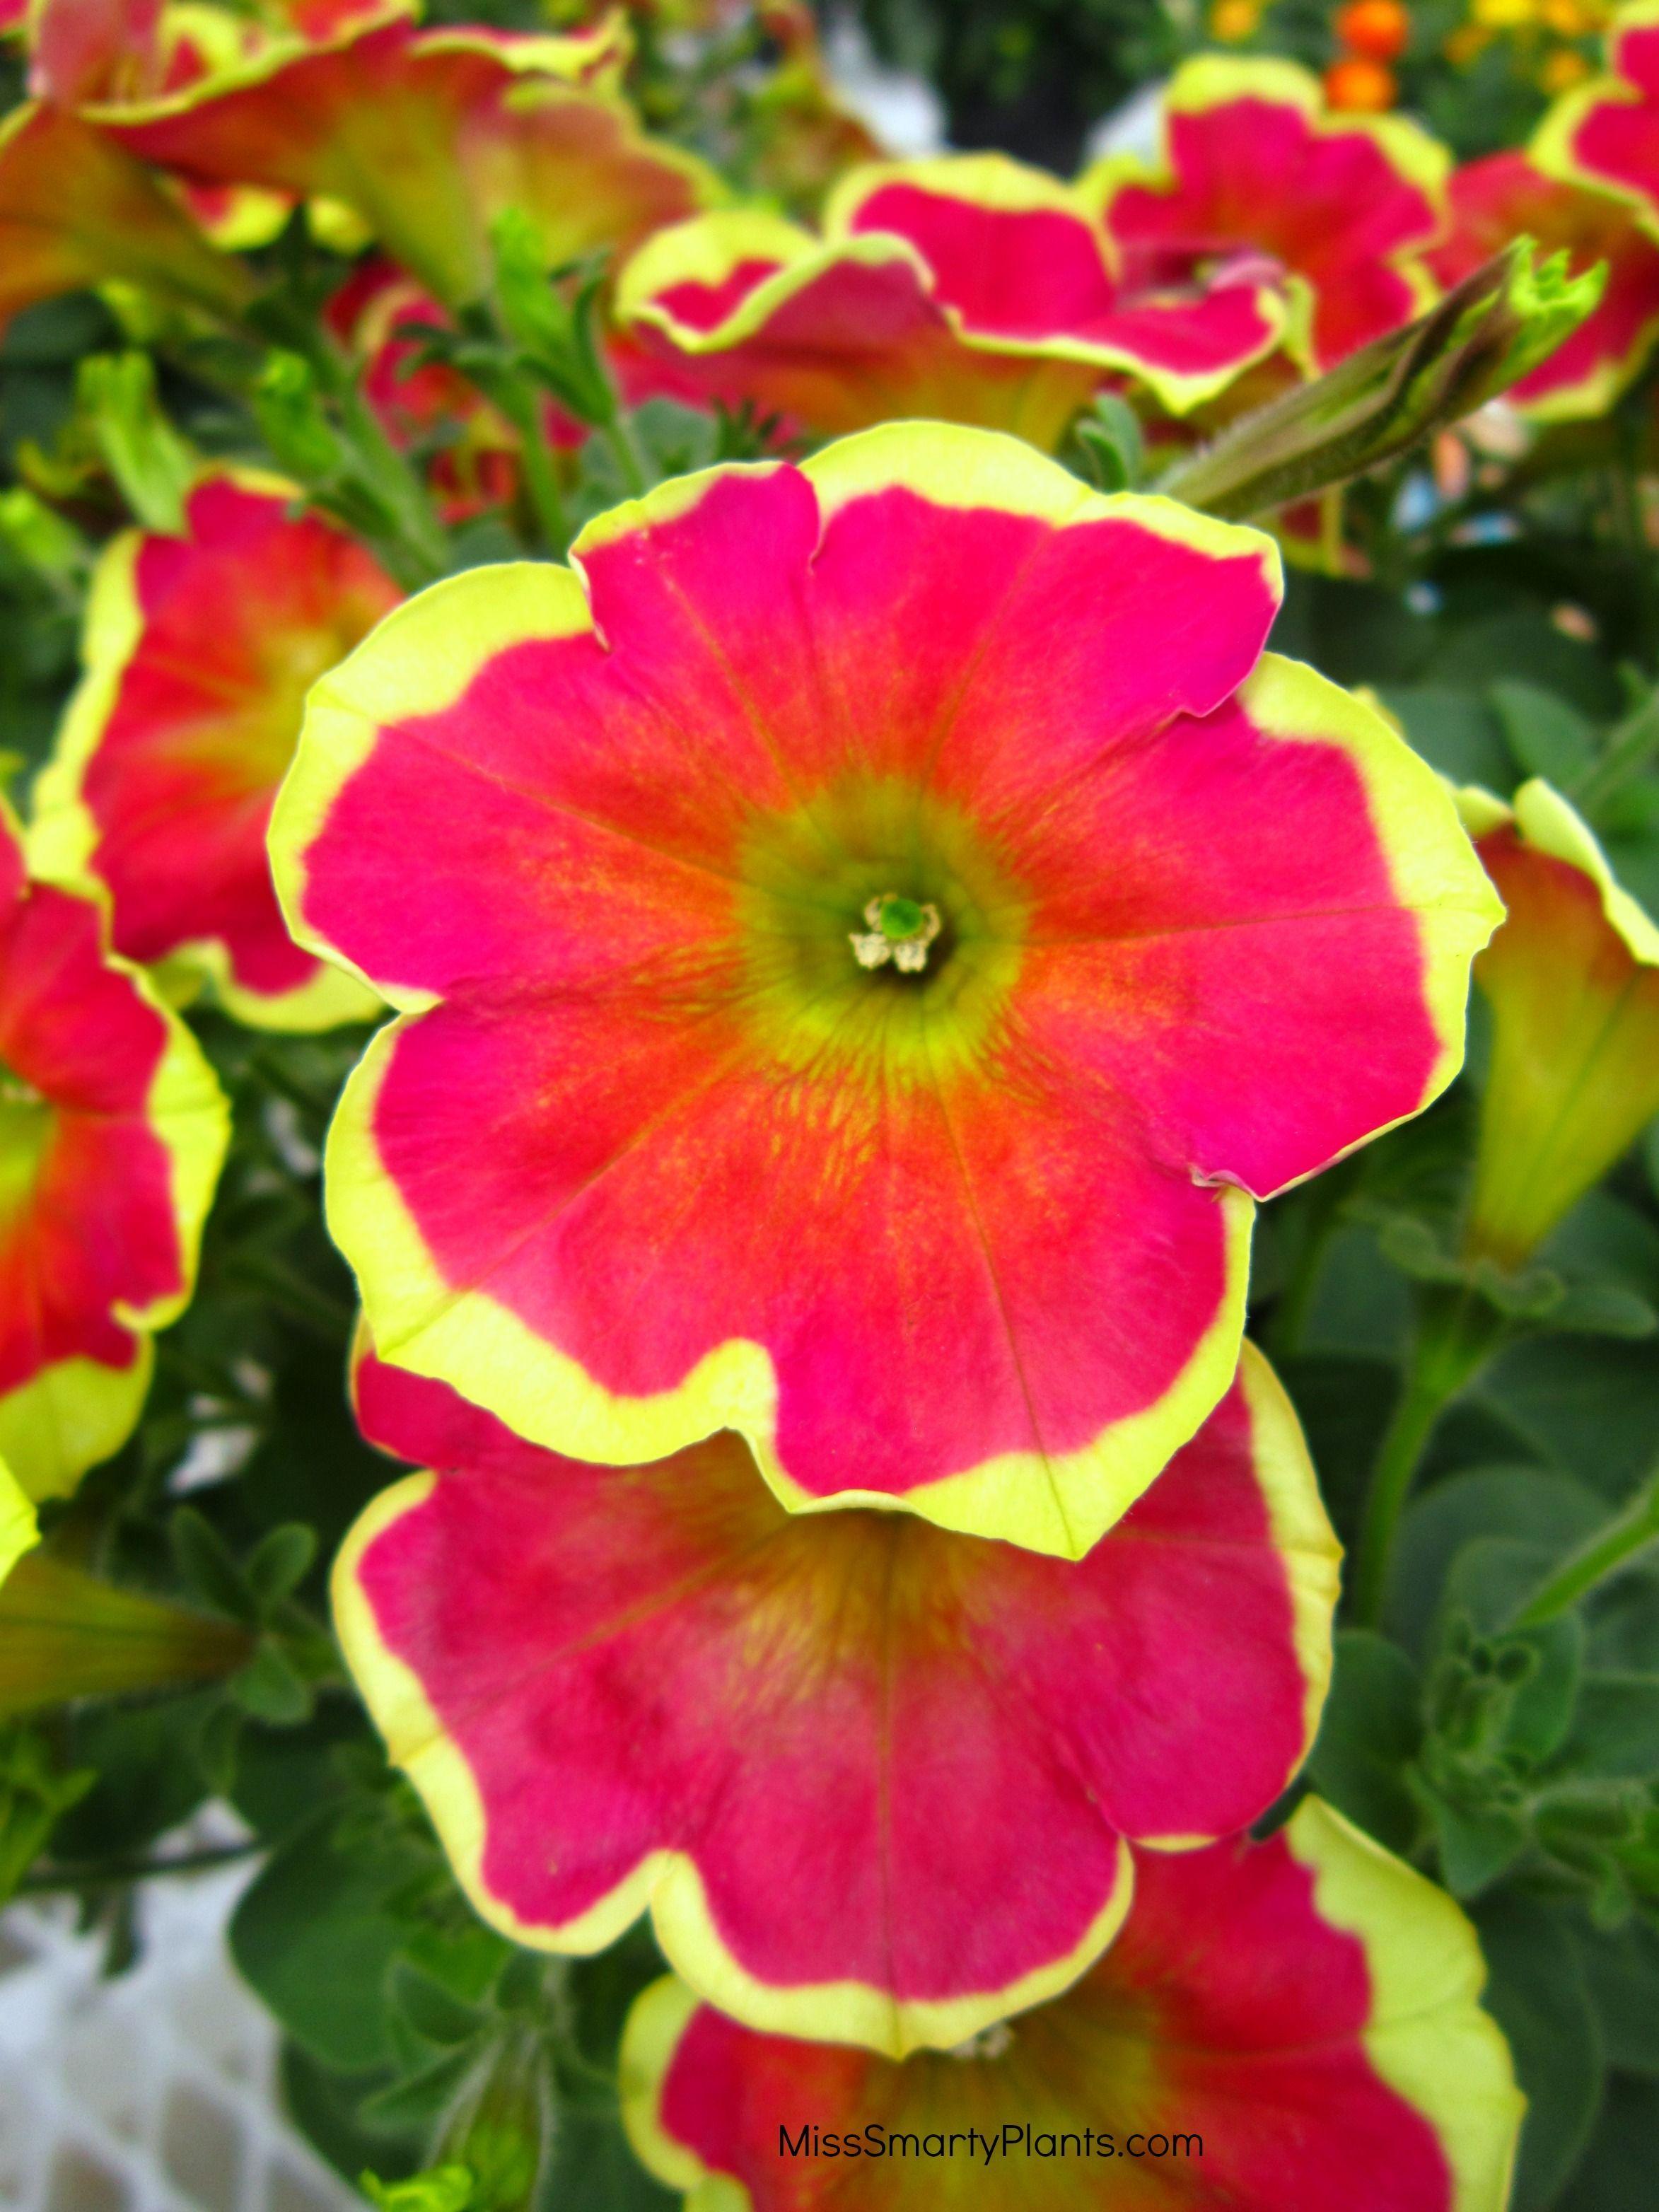 Winter Flowers For Florida In 2020 Petunia Flower Florida Flowers Night Sky Petunia